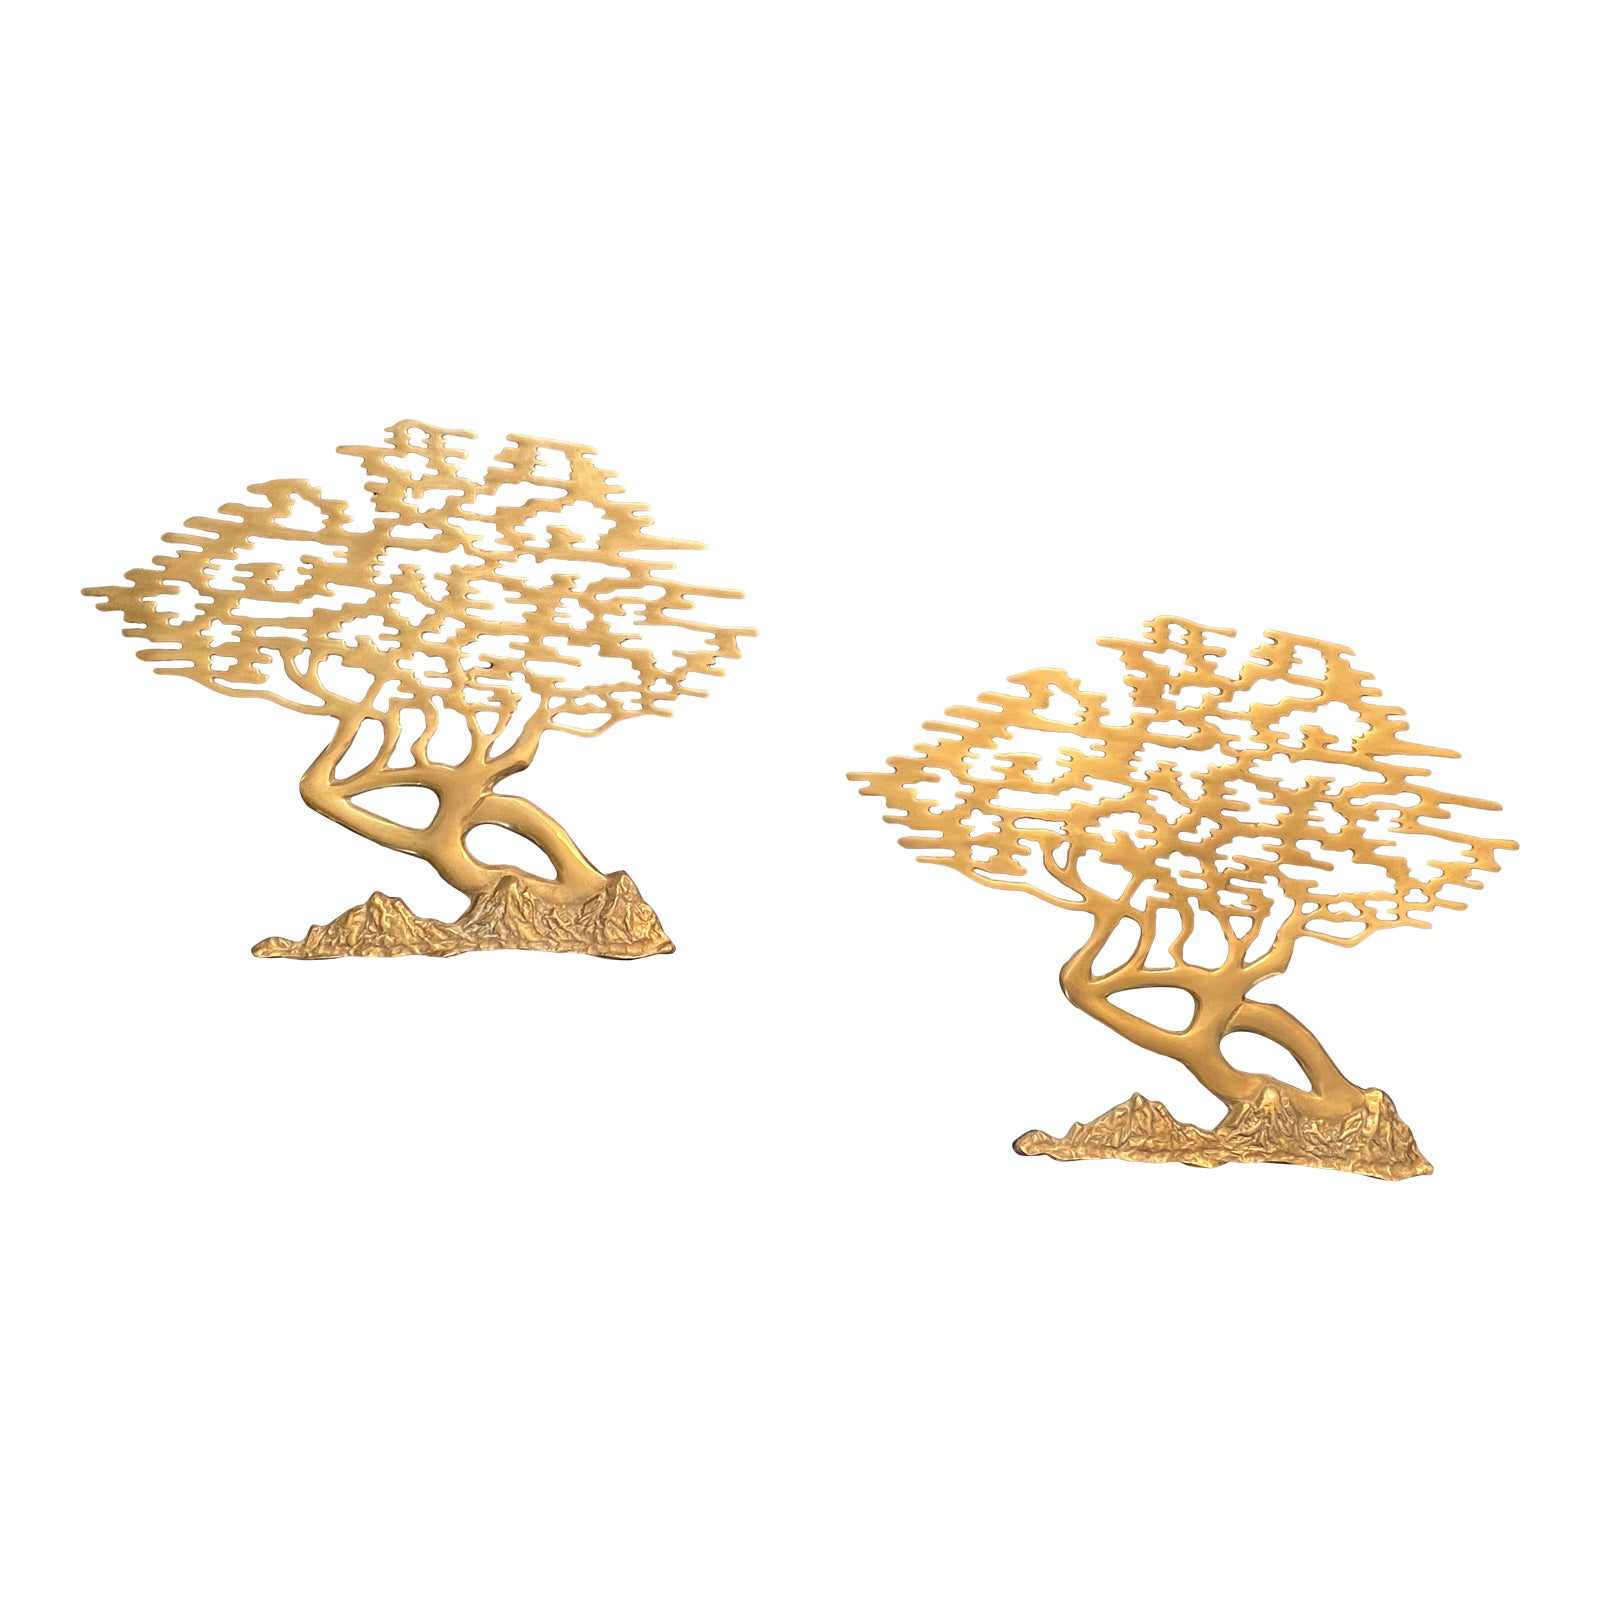 Vintage Brass Bonsai Tree Wall Hangings A Pair Chairish